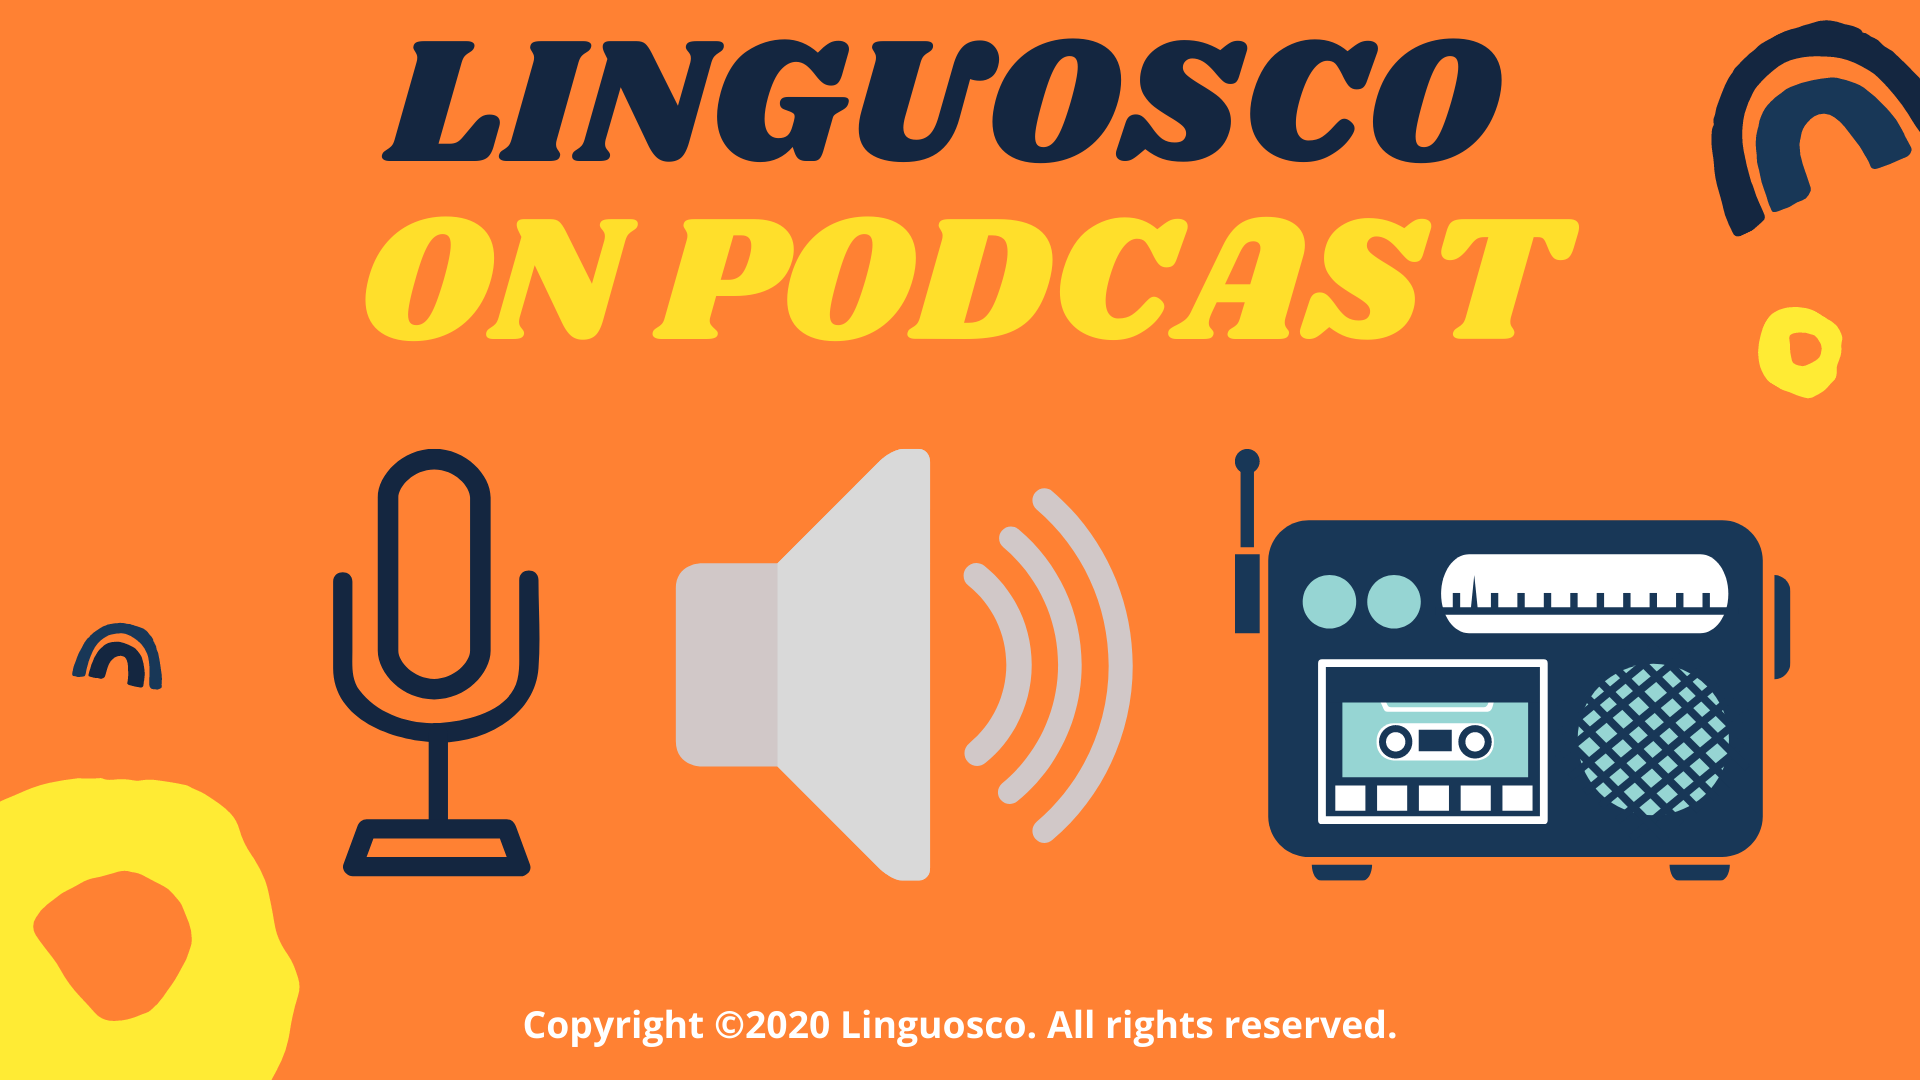 Linguosco on Podcast